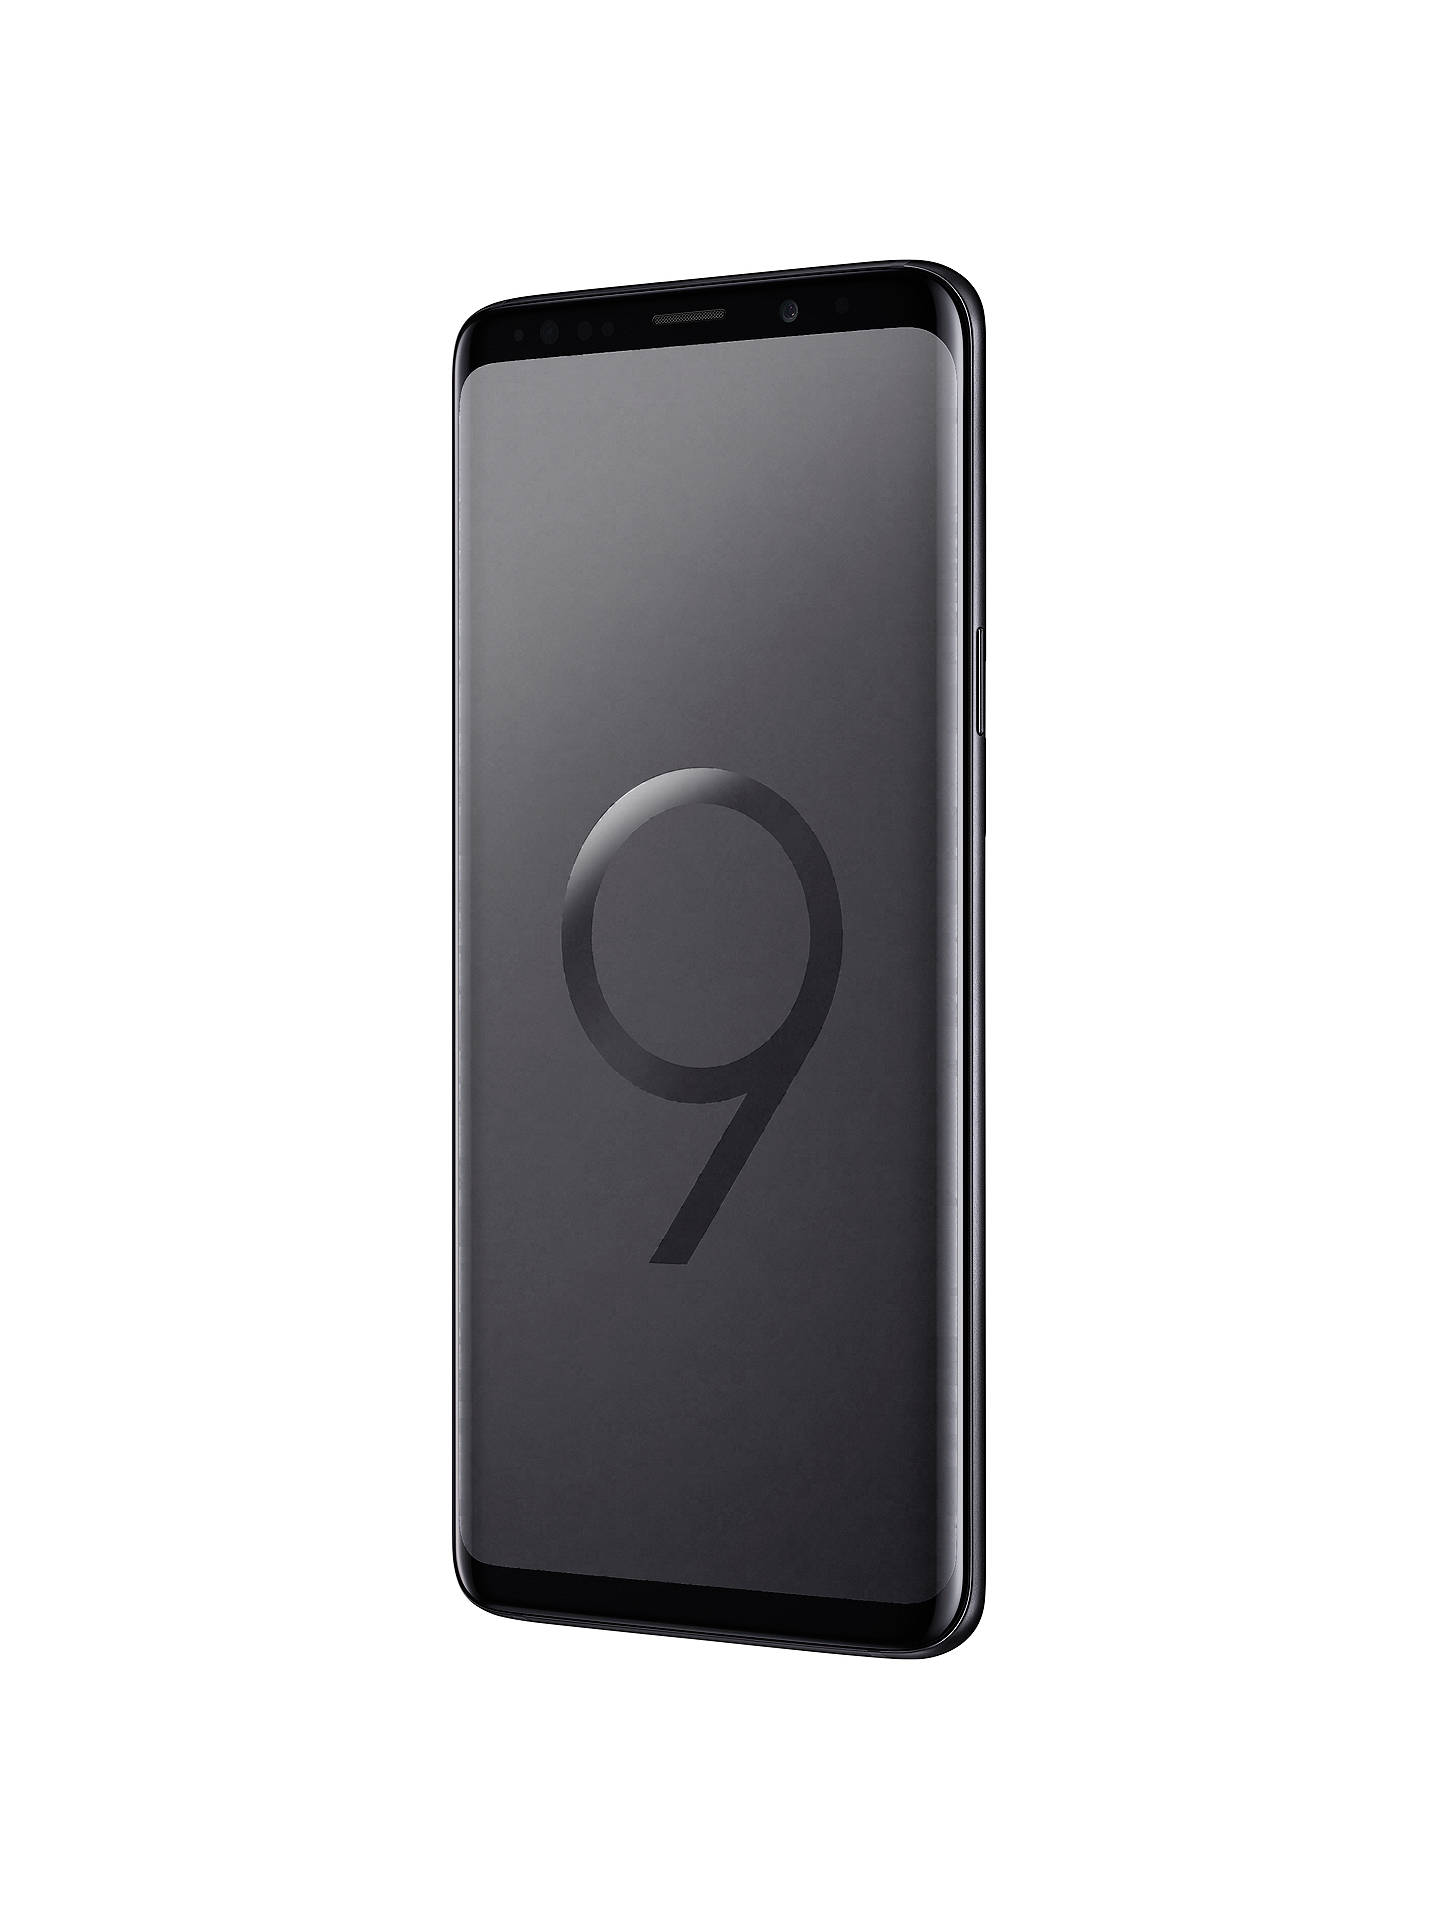 Samsung Galaxy S9 Plus Smartphone Android 6 2 4g Lte Sim Free